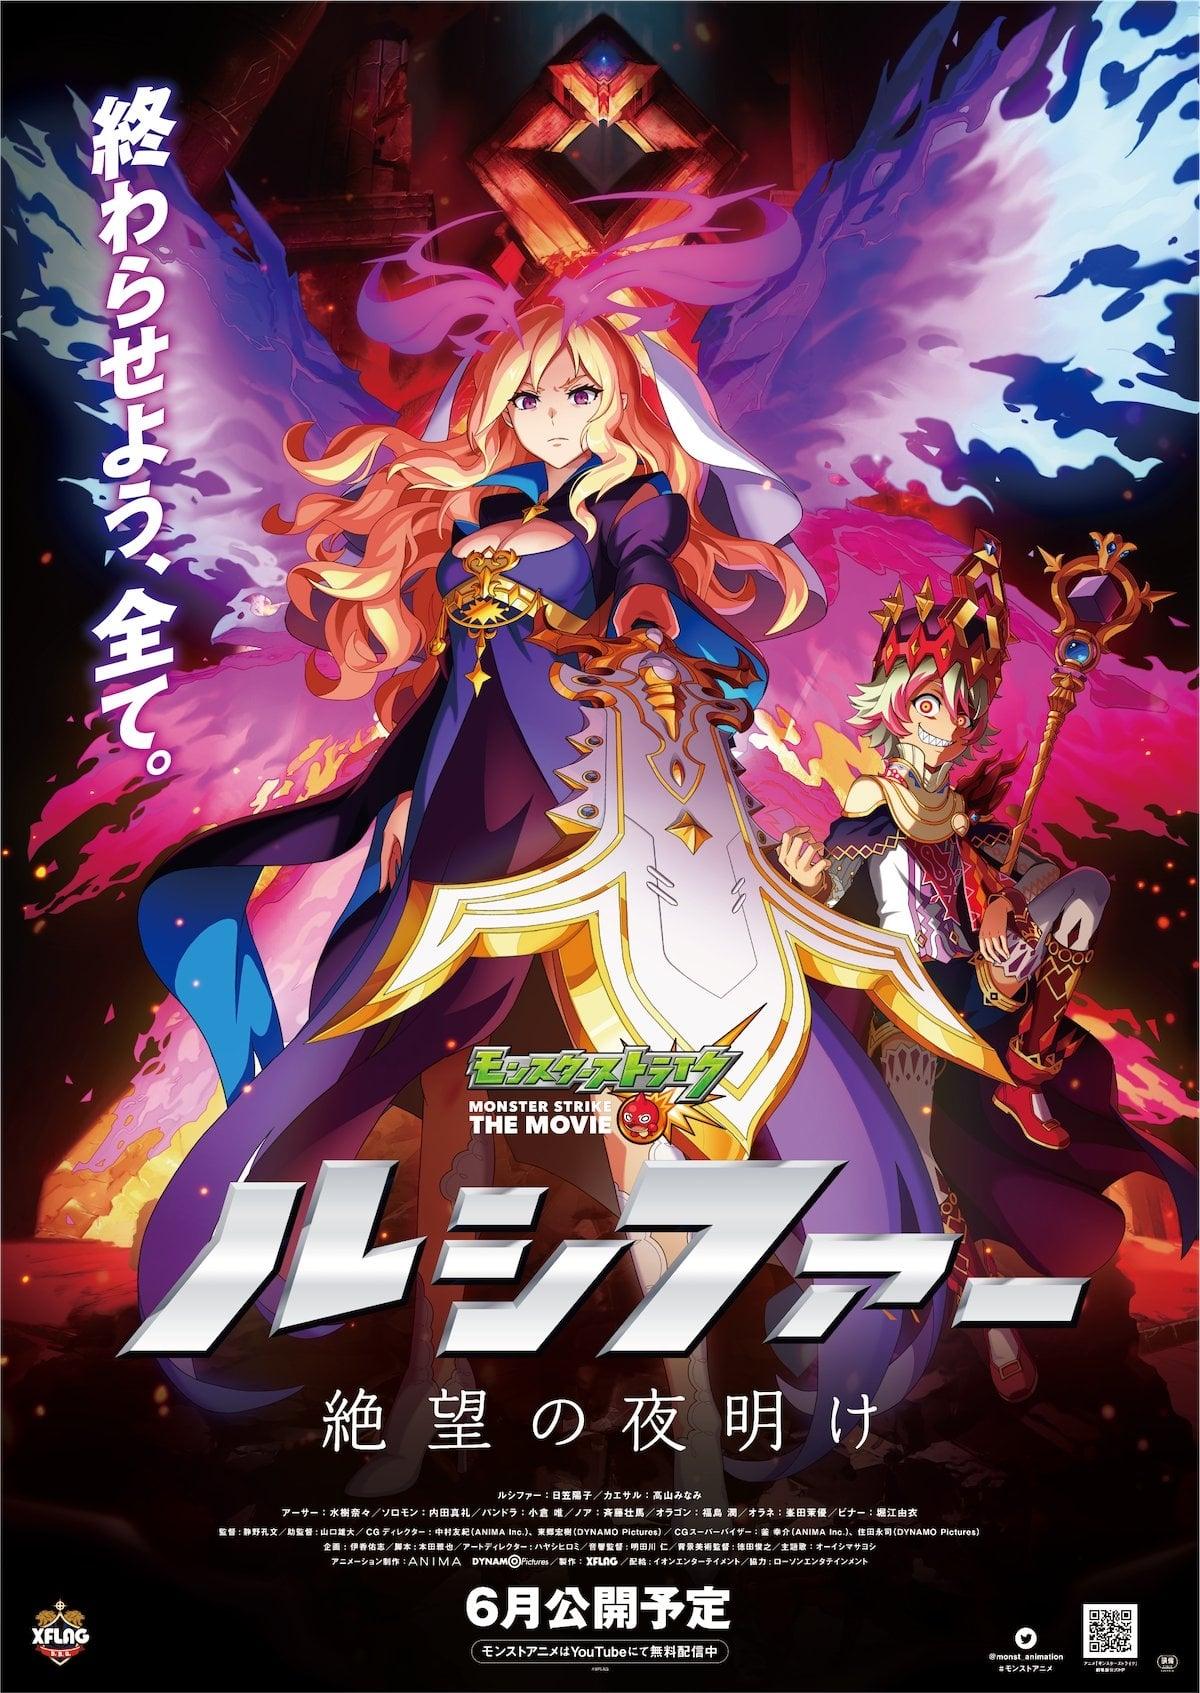 Monster Strike the Movie: Lucifer - Zetsubou no Yoake